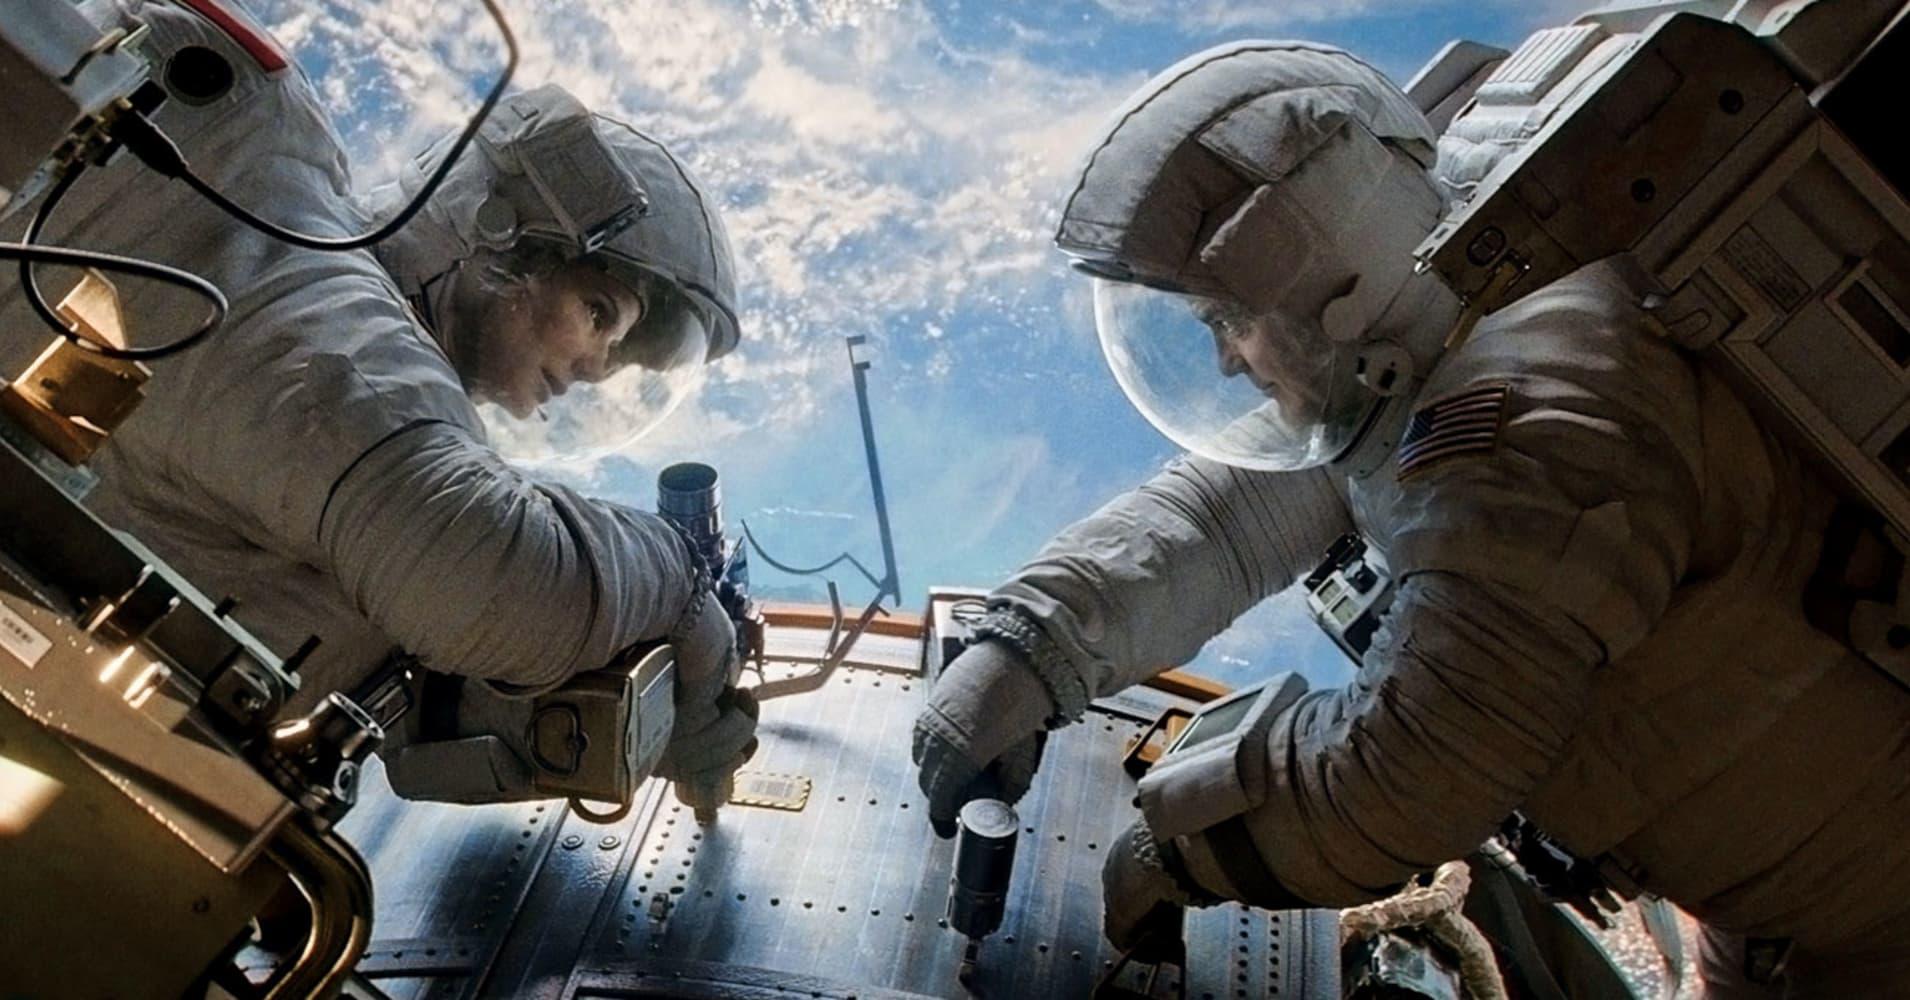 Sandra Bullock and George Clooney in Gravity.